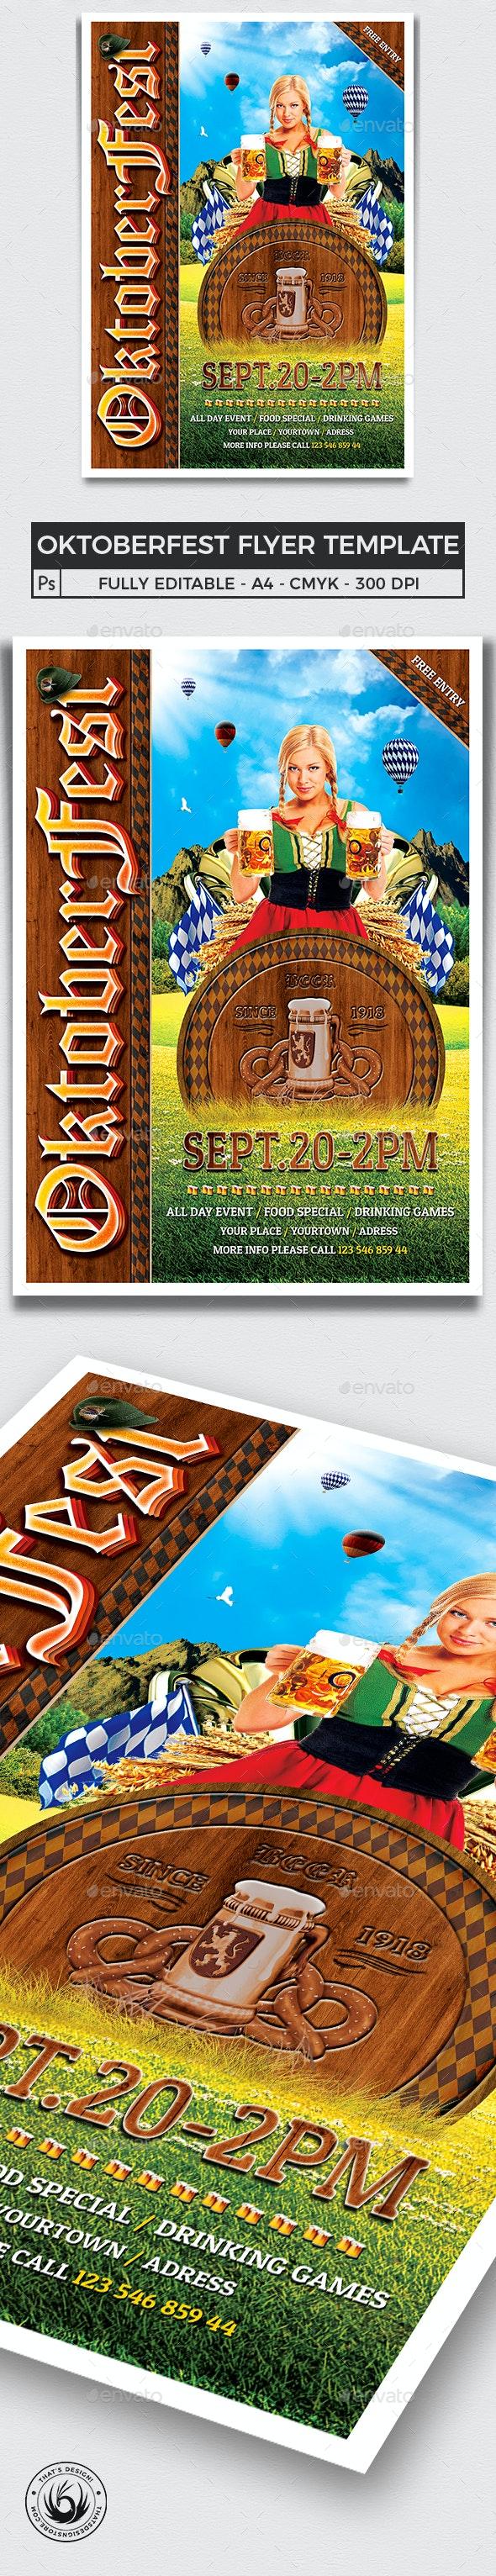 Oktoberfest Flyer Template V3 - Holidays Events